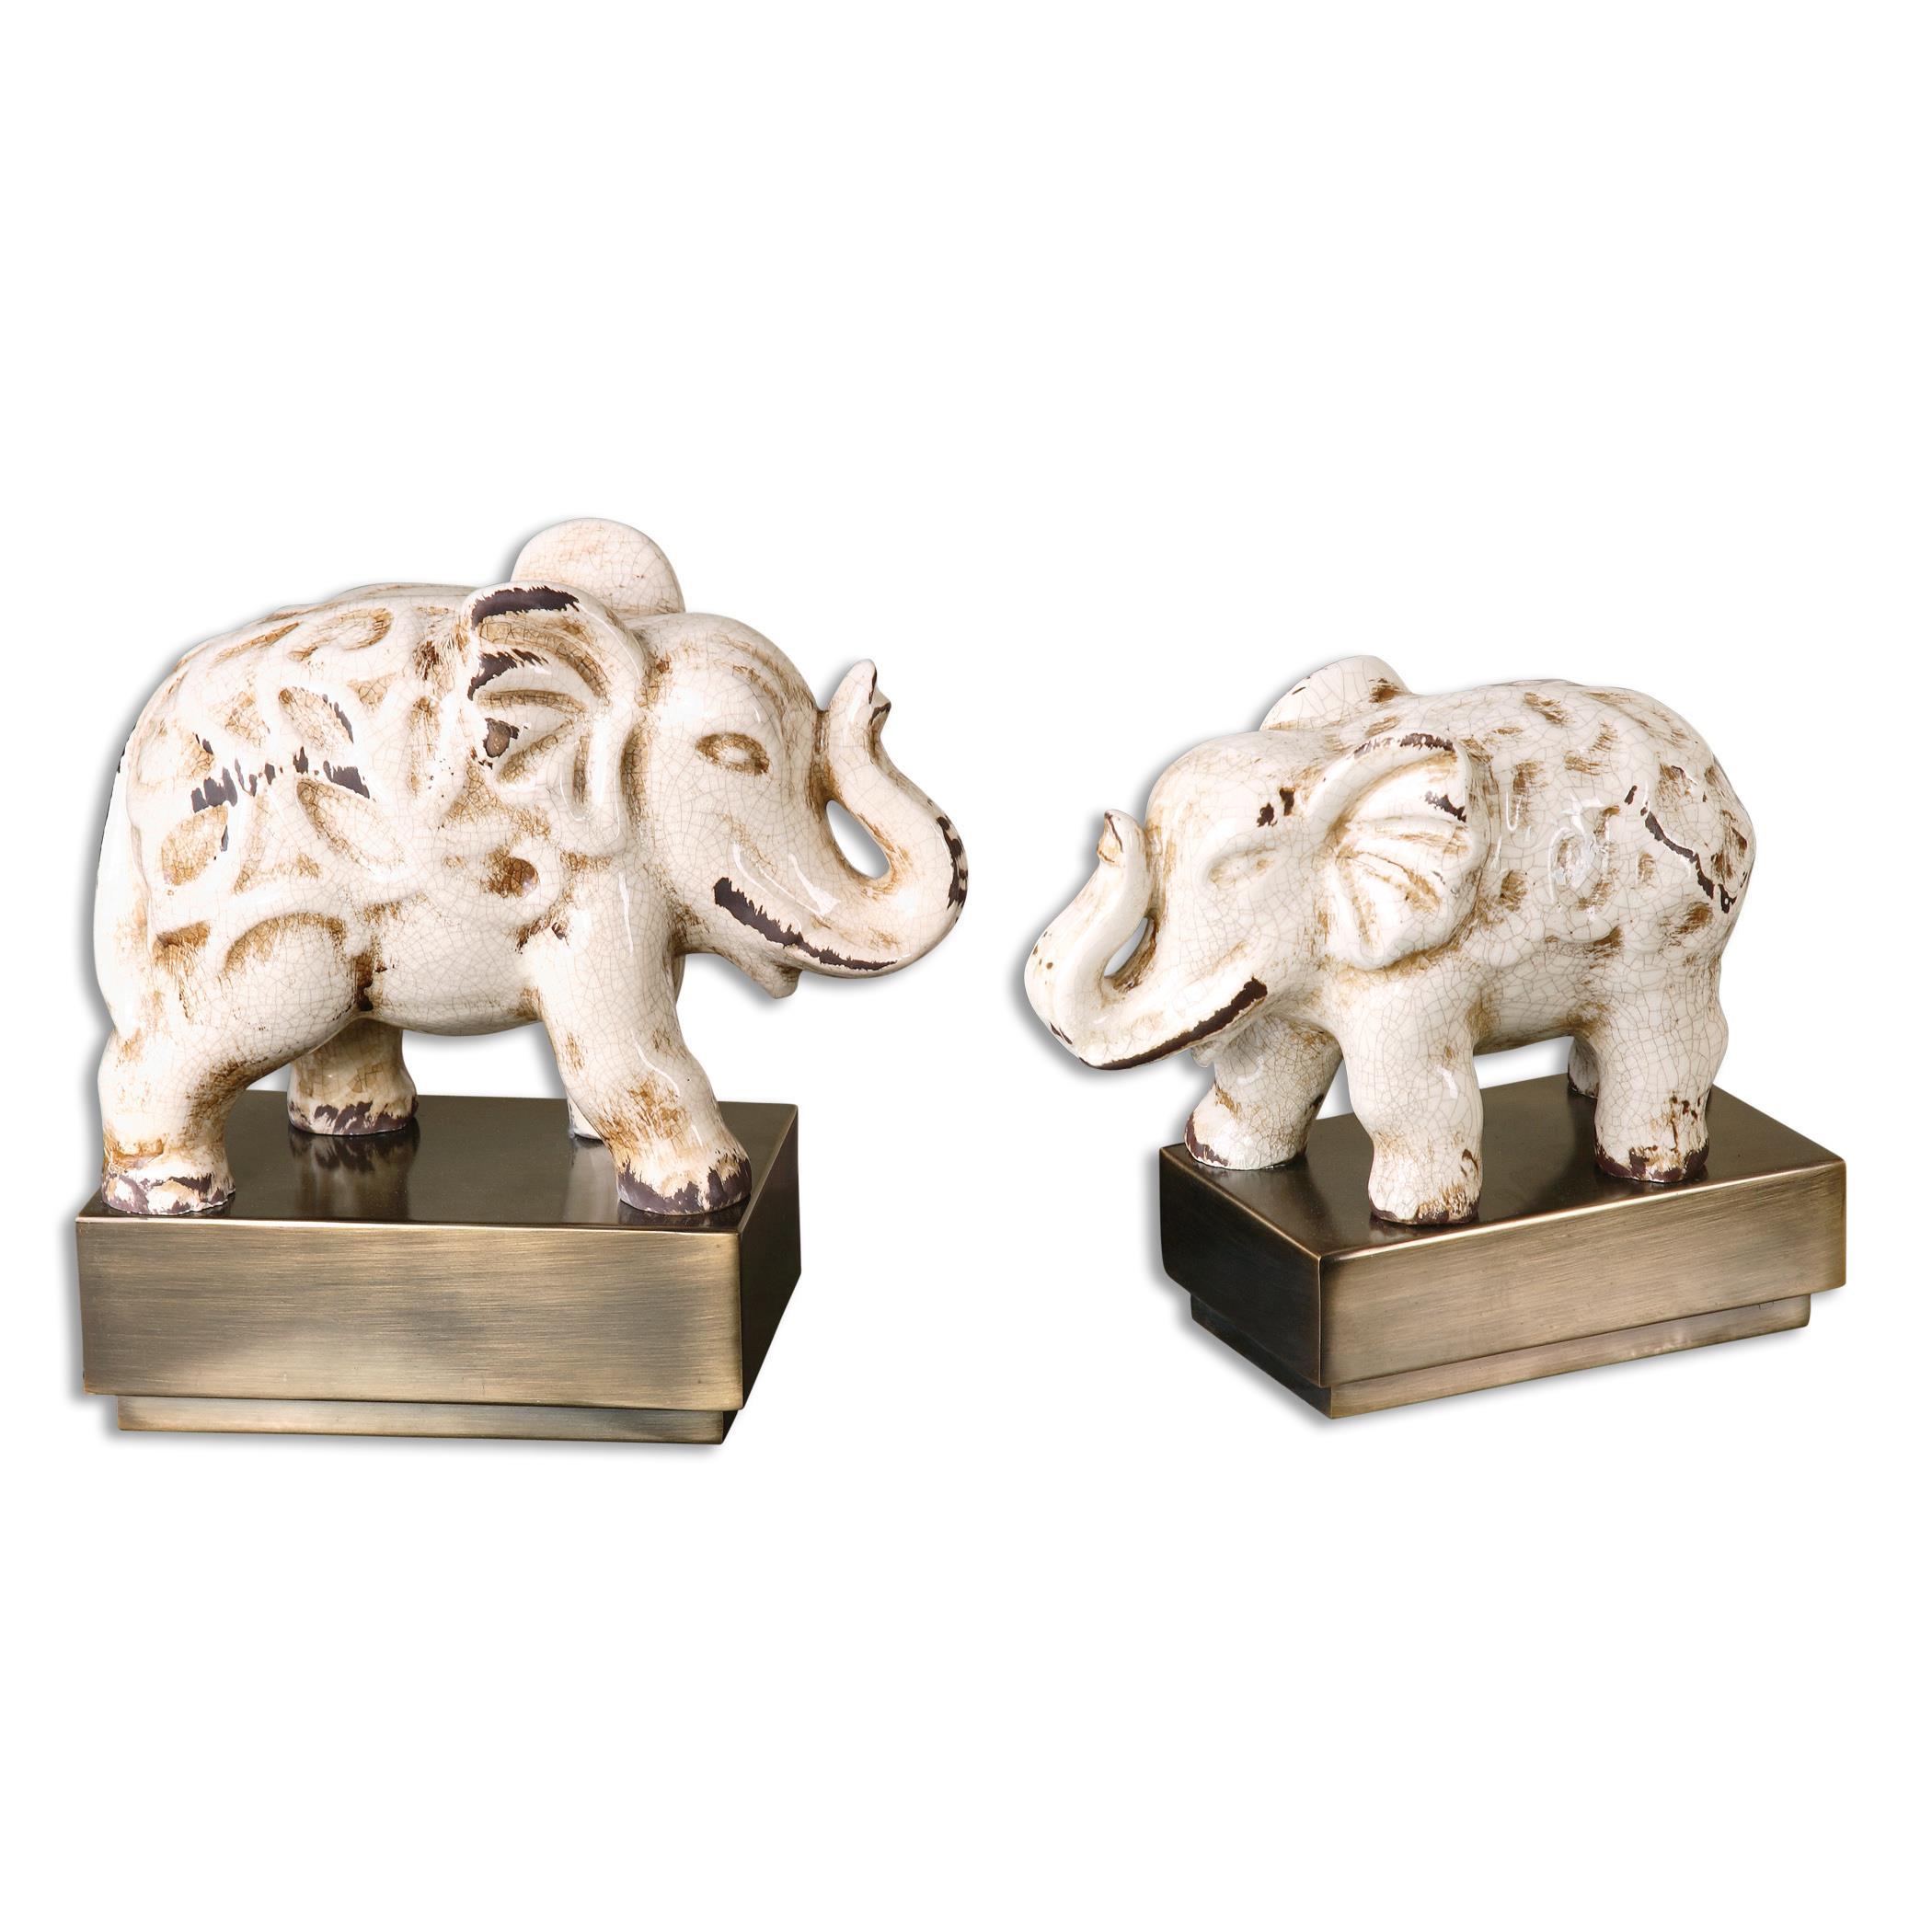 Uttermost Accessories Maven Elephant Sculptures, S/2 - Item Number: 19949